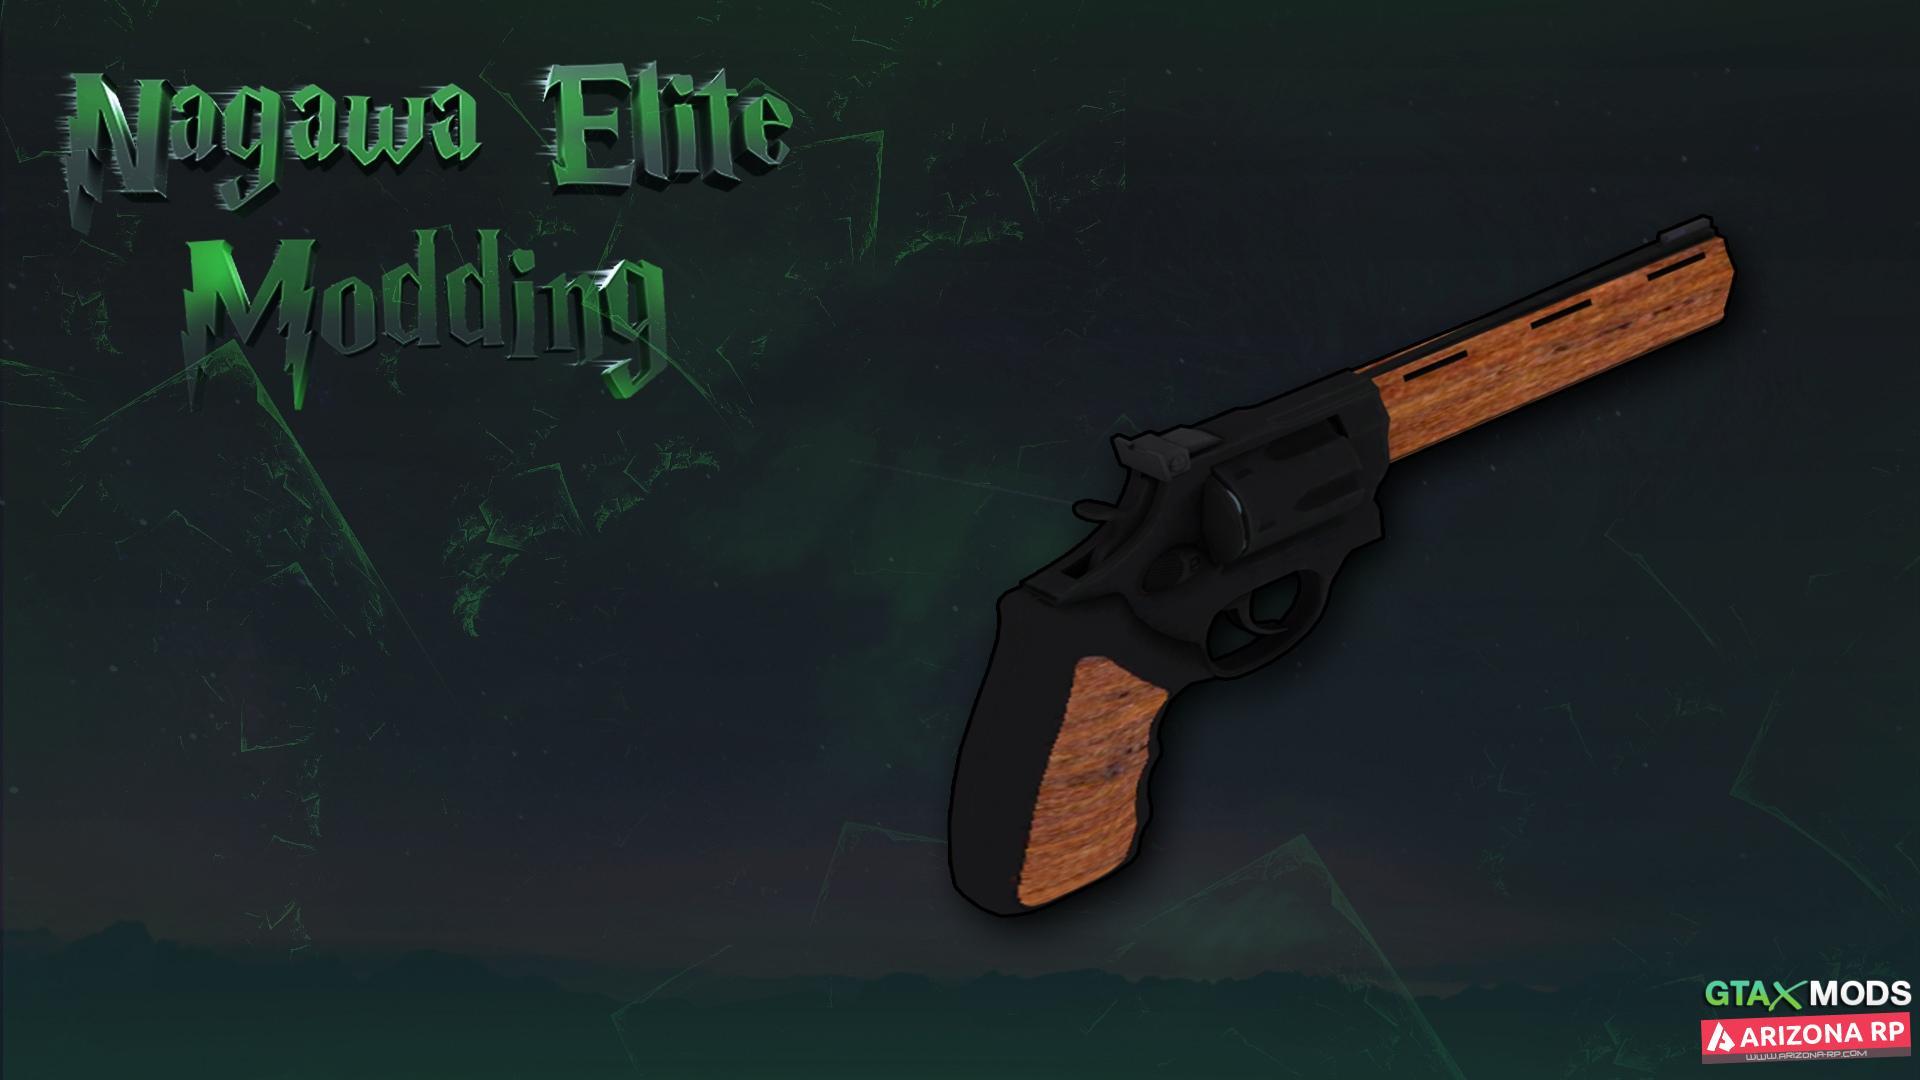 New Deagle | Nagawa Elite Modding